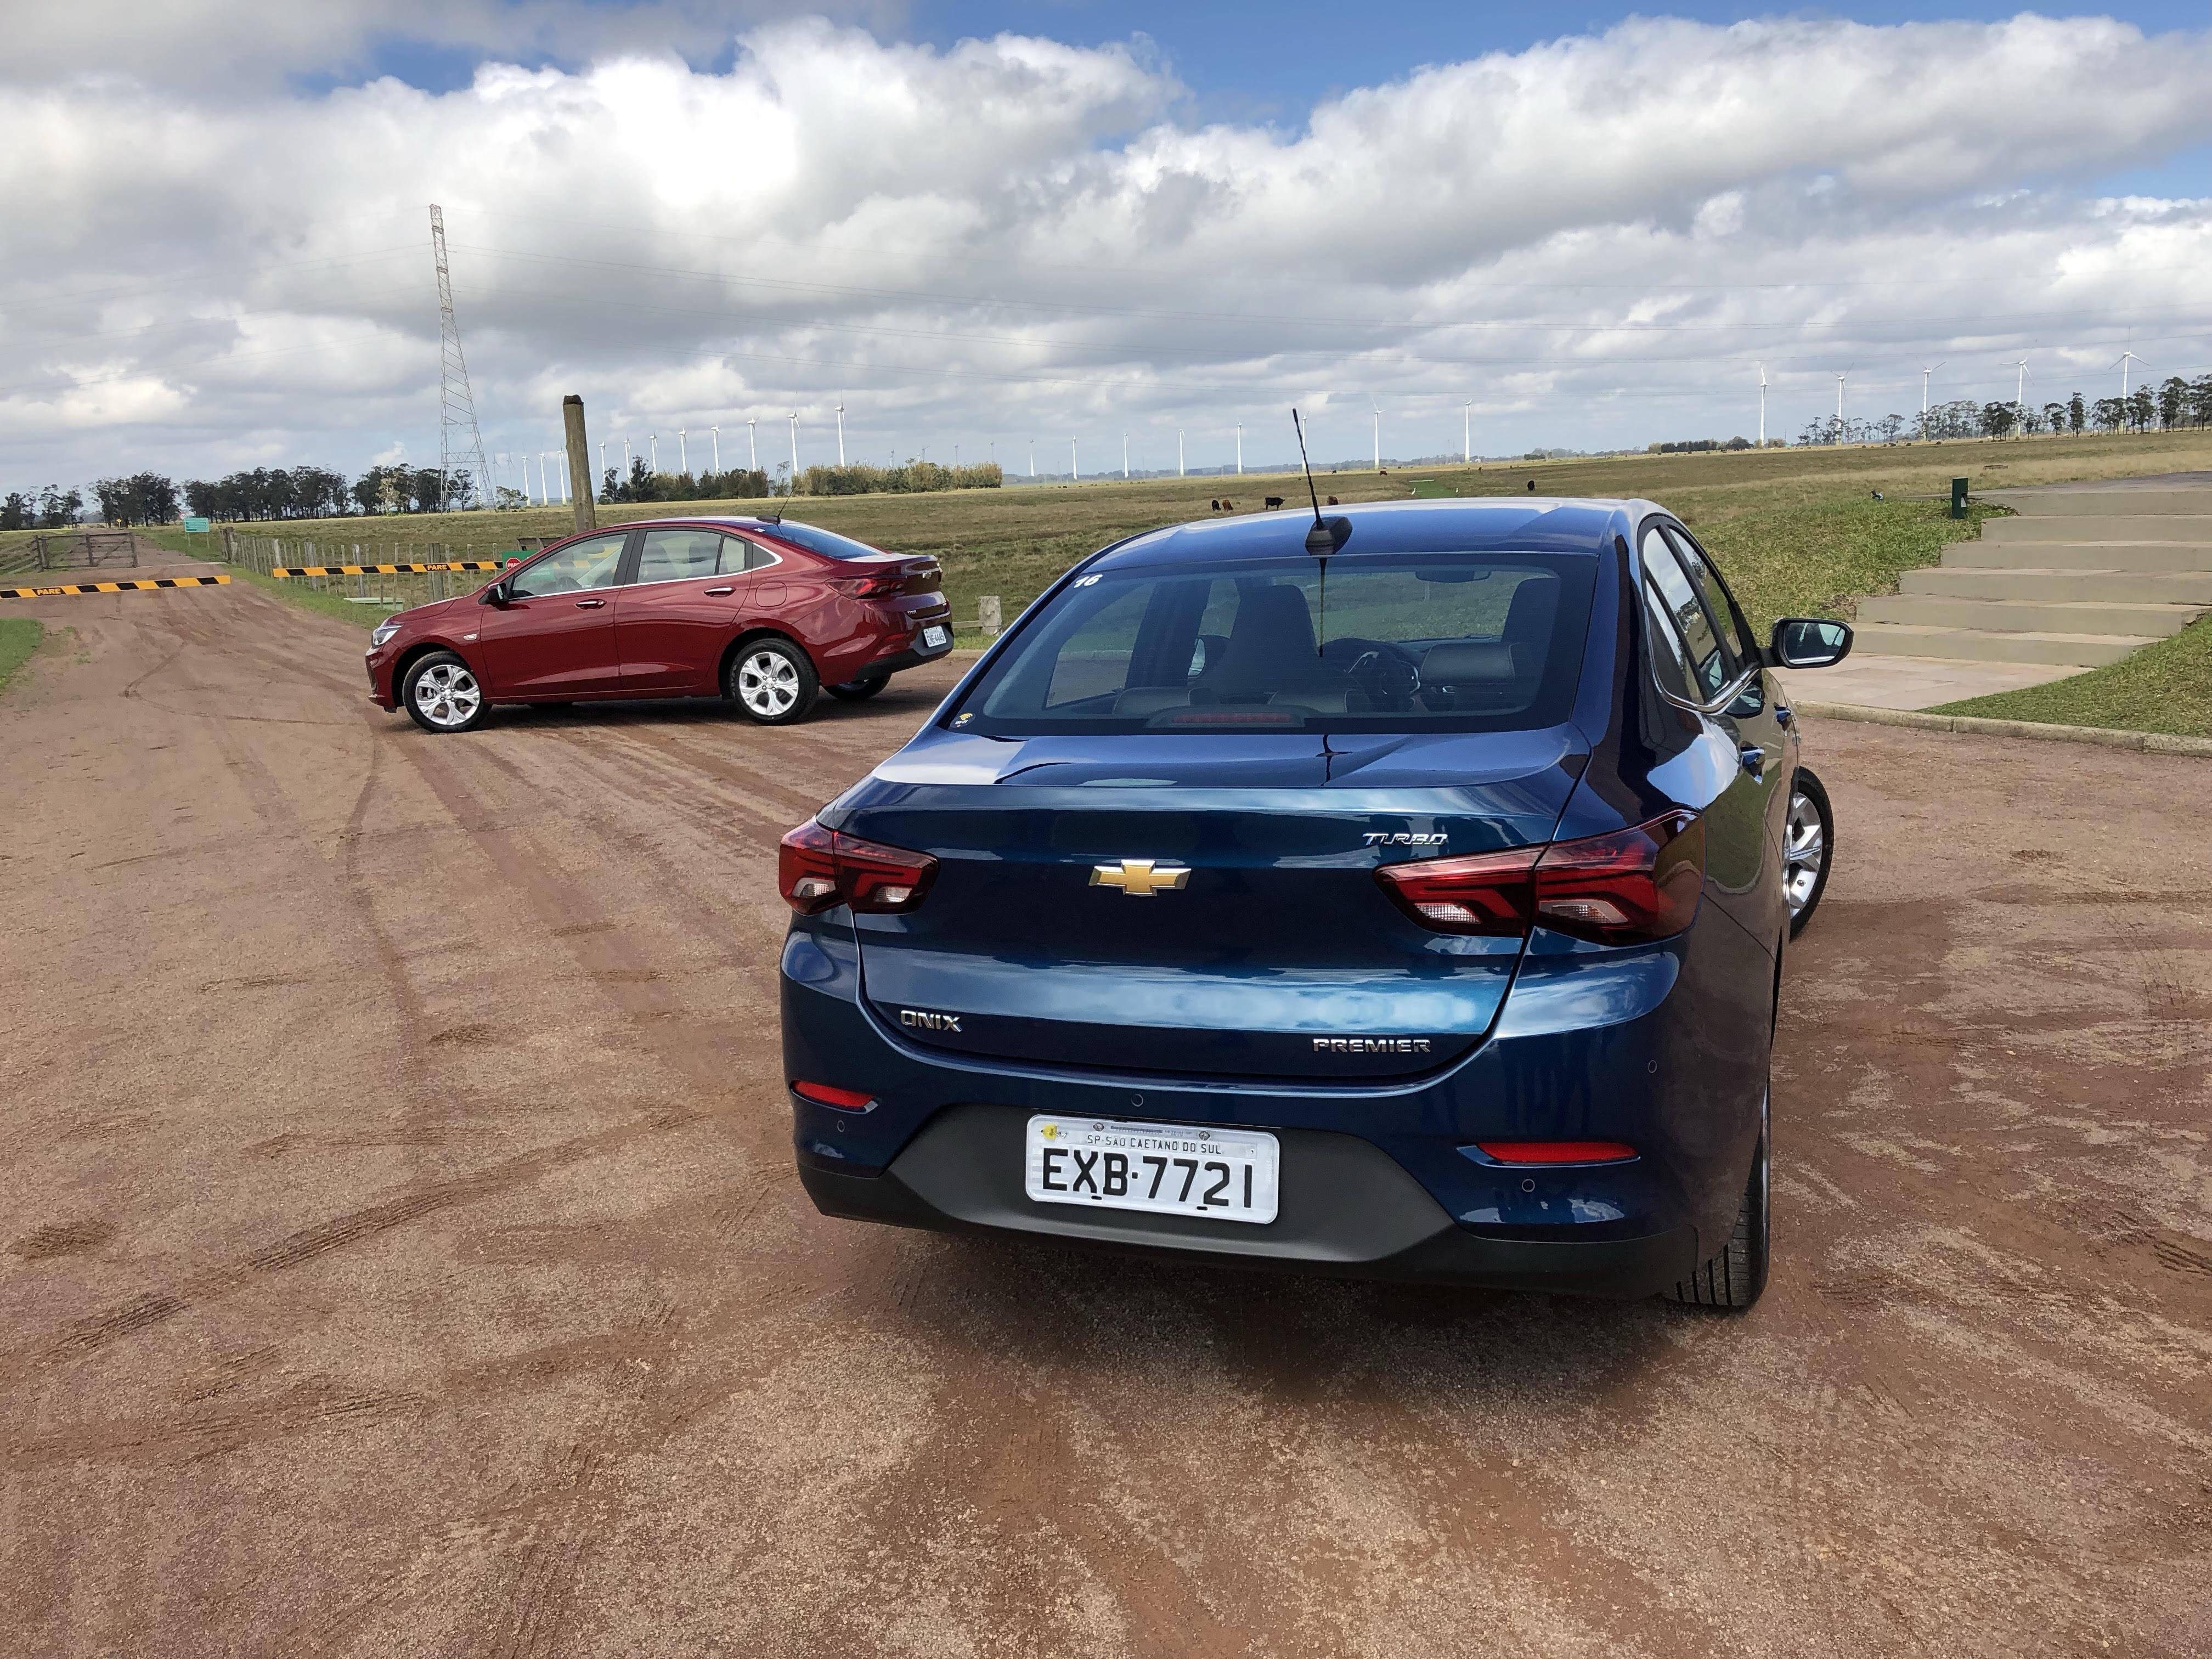 Chevrolet Onix Plus. Foto: Caue Lira/iG